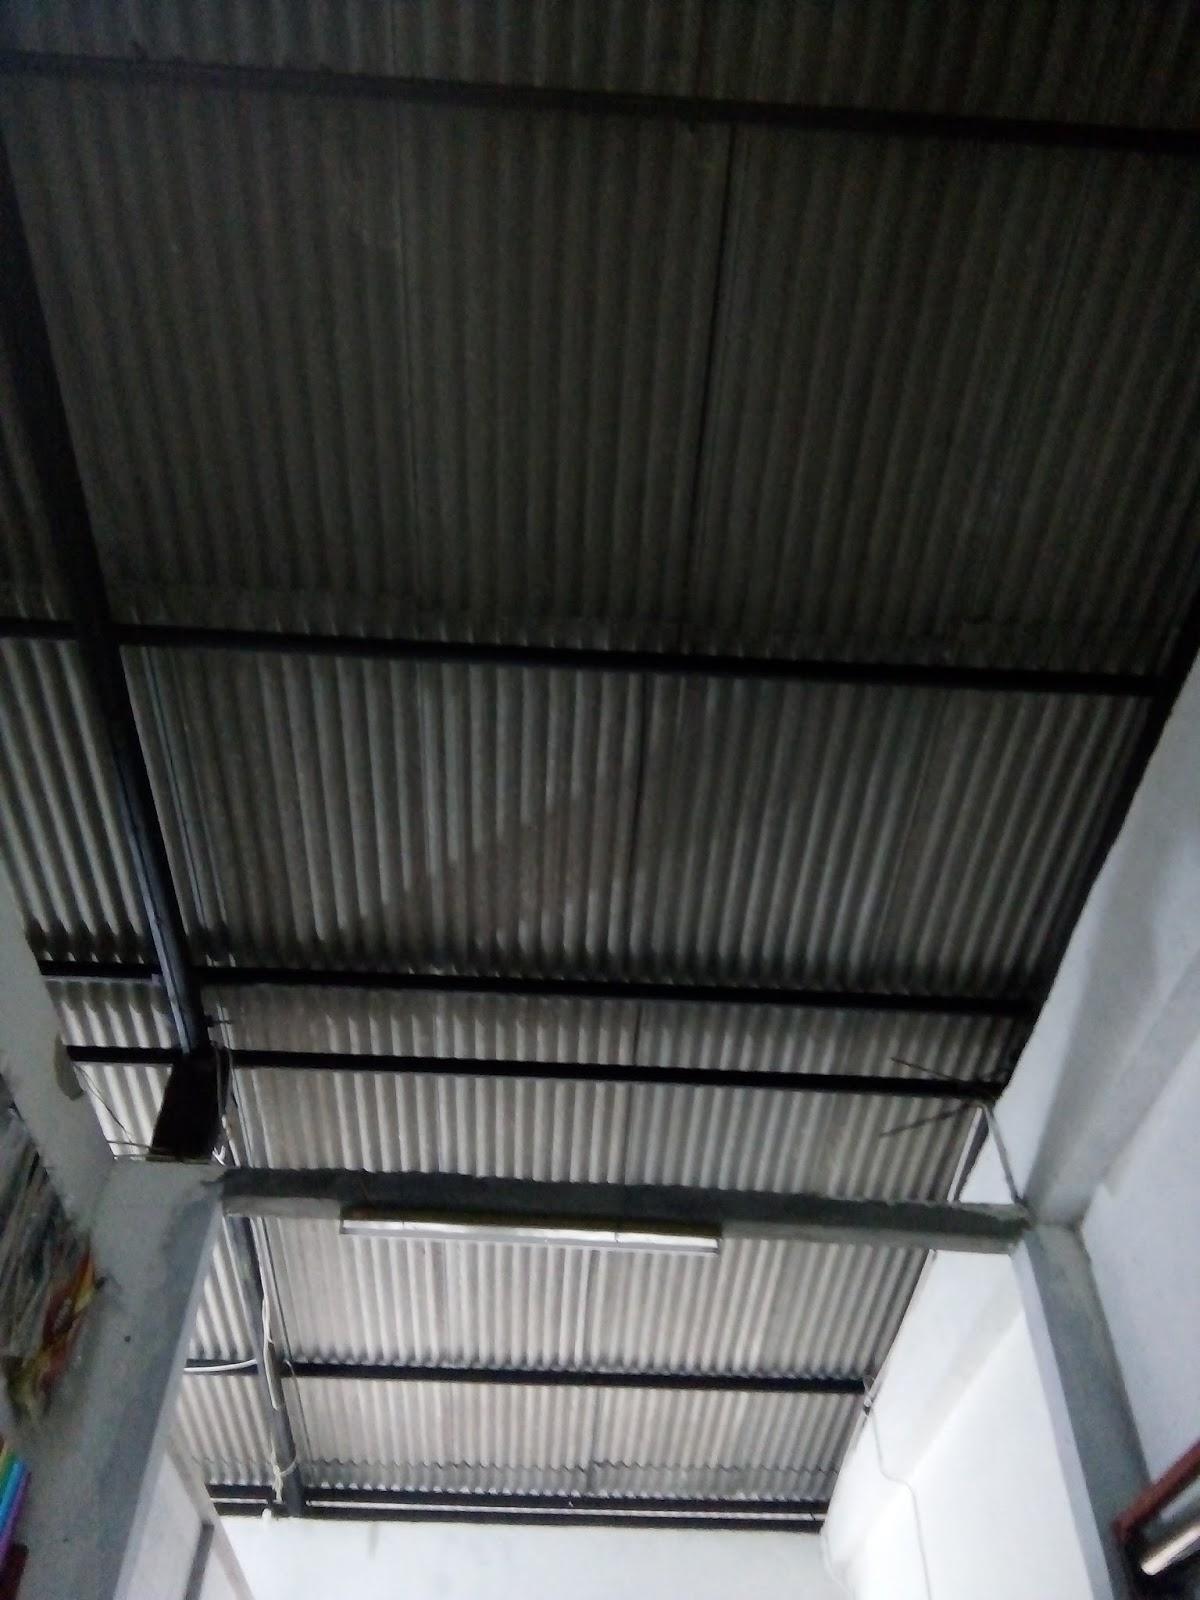 Perbandingan Harga Baja Ringan Vs Kayu Biaya Rangka Atap